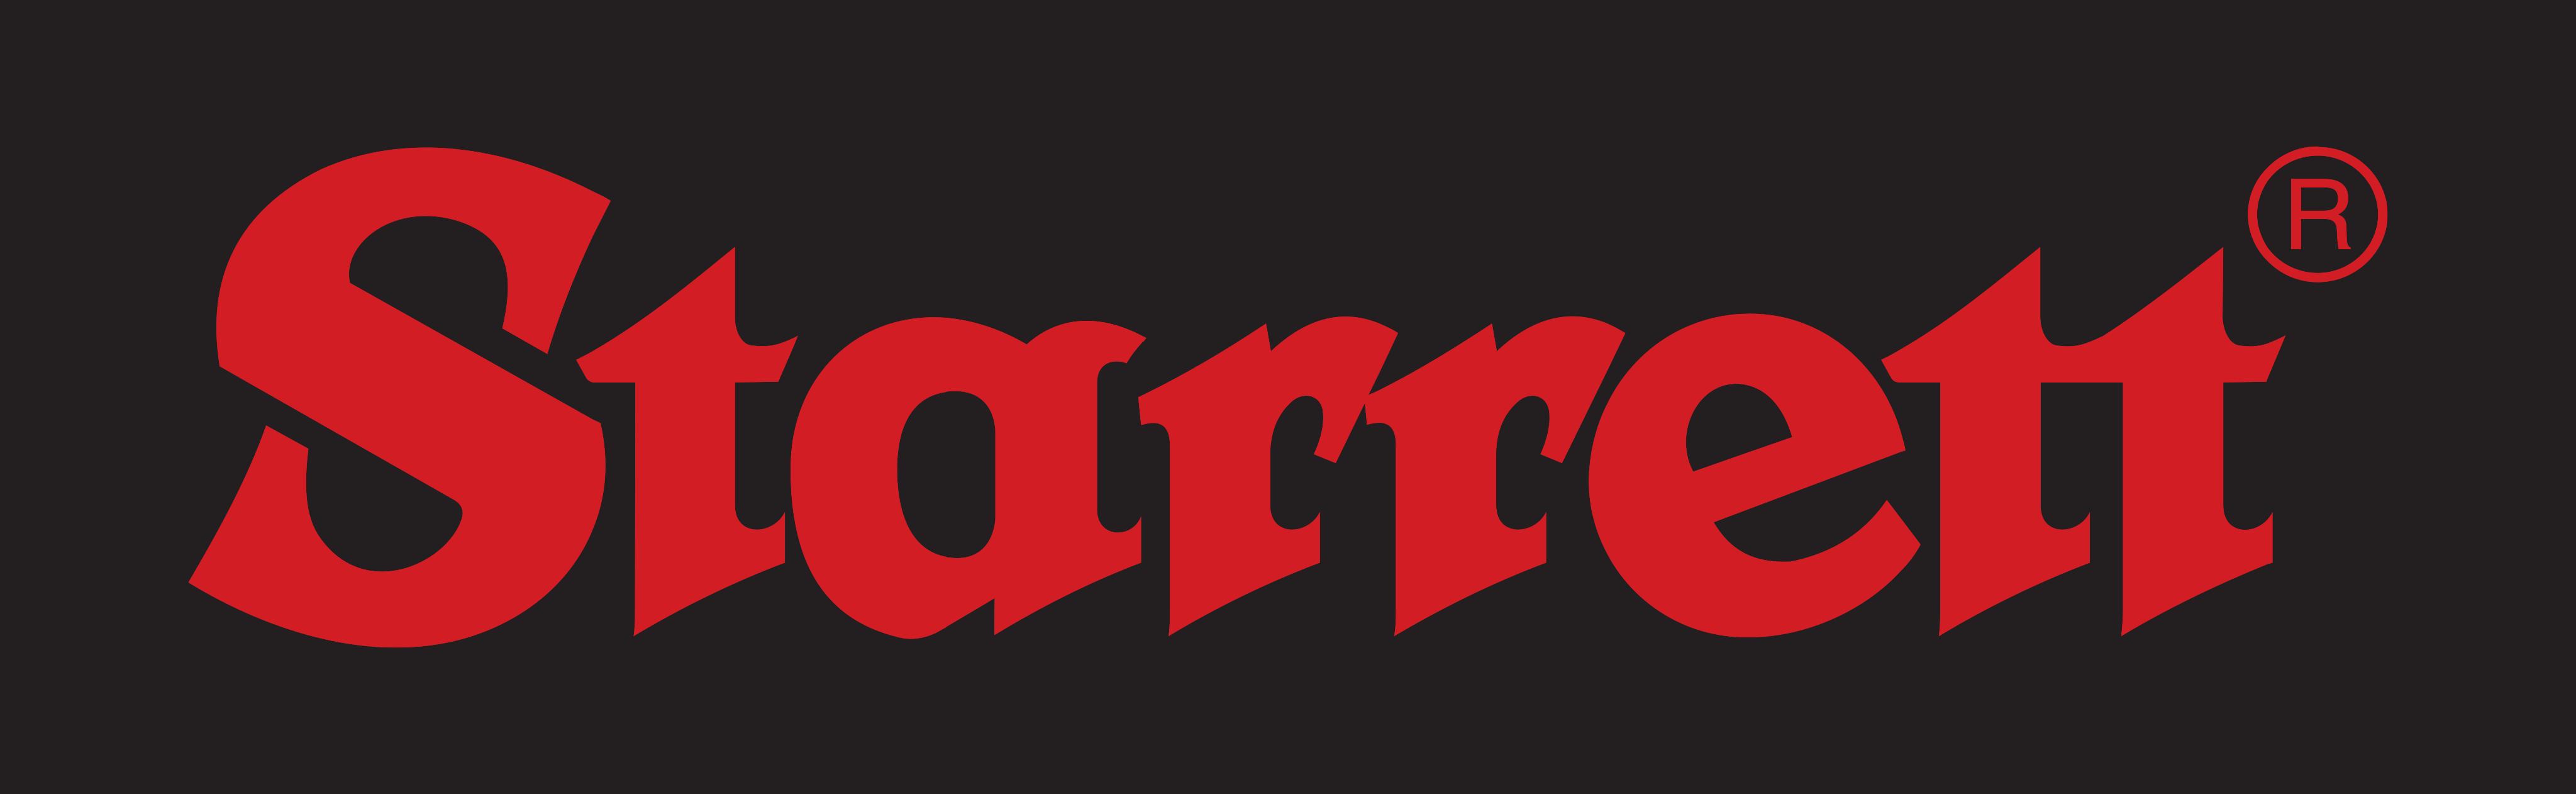 starrett logo 2 - Starrett Logo